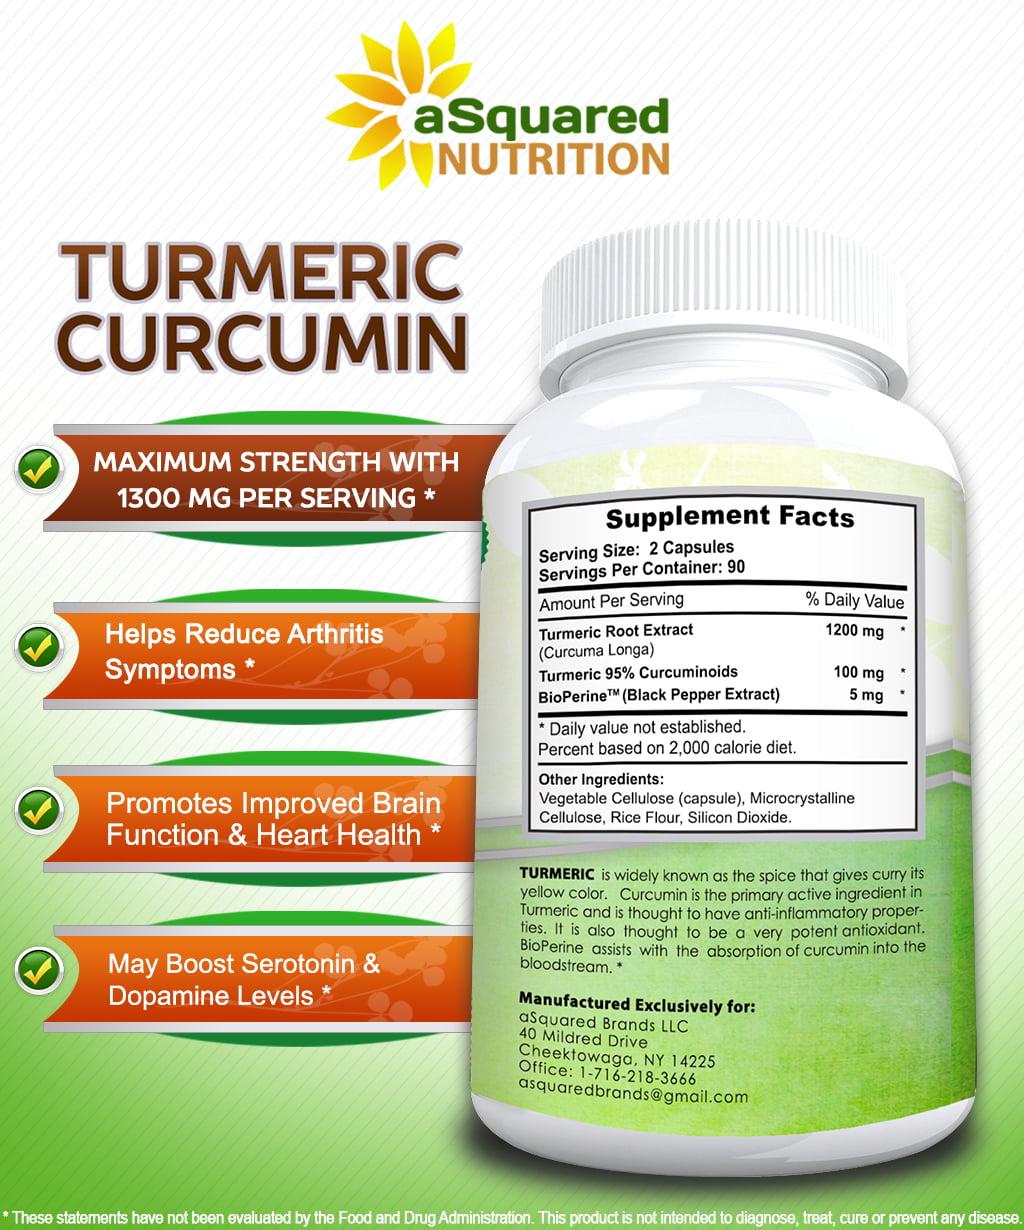 aSquared Nutrition Pure Turmeric Curcumin 1300mg with BioPerine Black  Pepper Extract -180 Capsules- 95% Curcuminoids, 100% Natural Tumeric Root  Powder